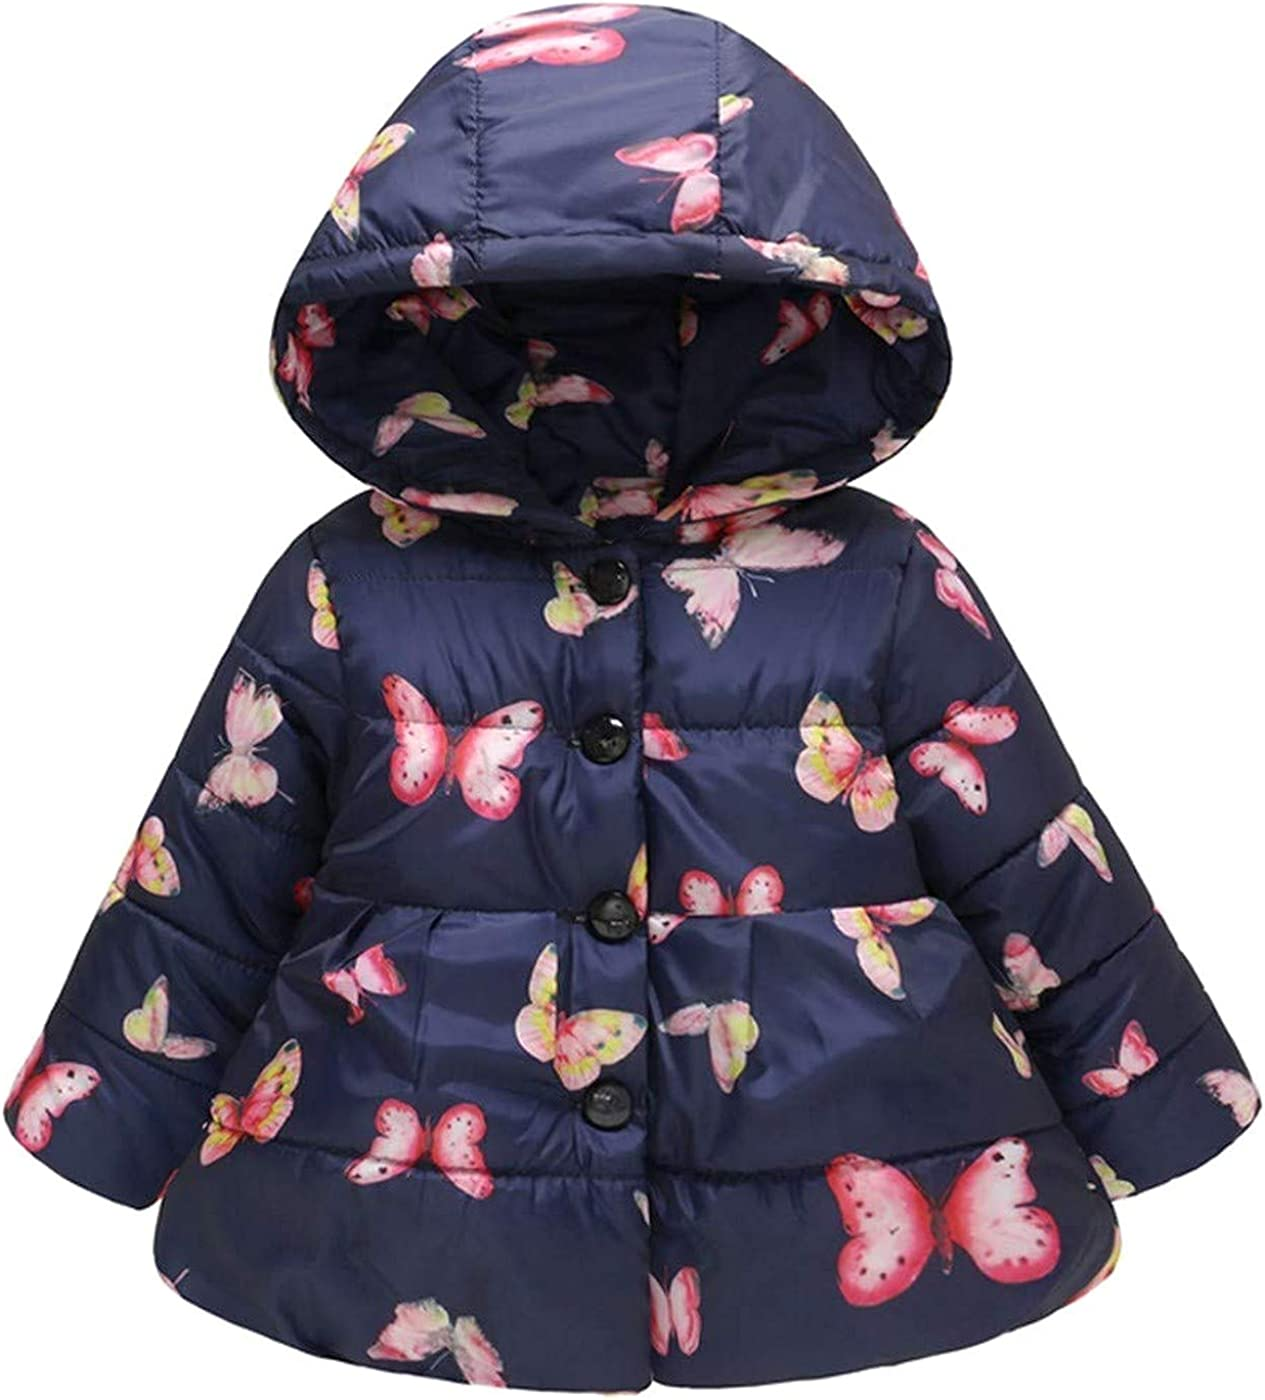 Baby-Girl-Boy Butterfly Winter Thick Warm Jacket Windproof Coat